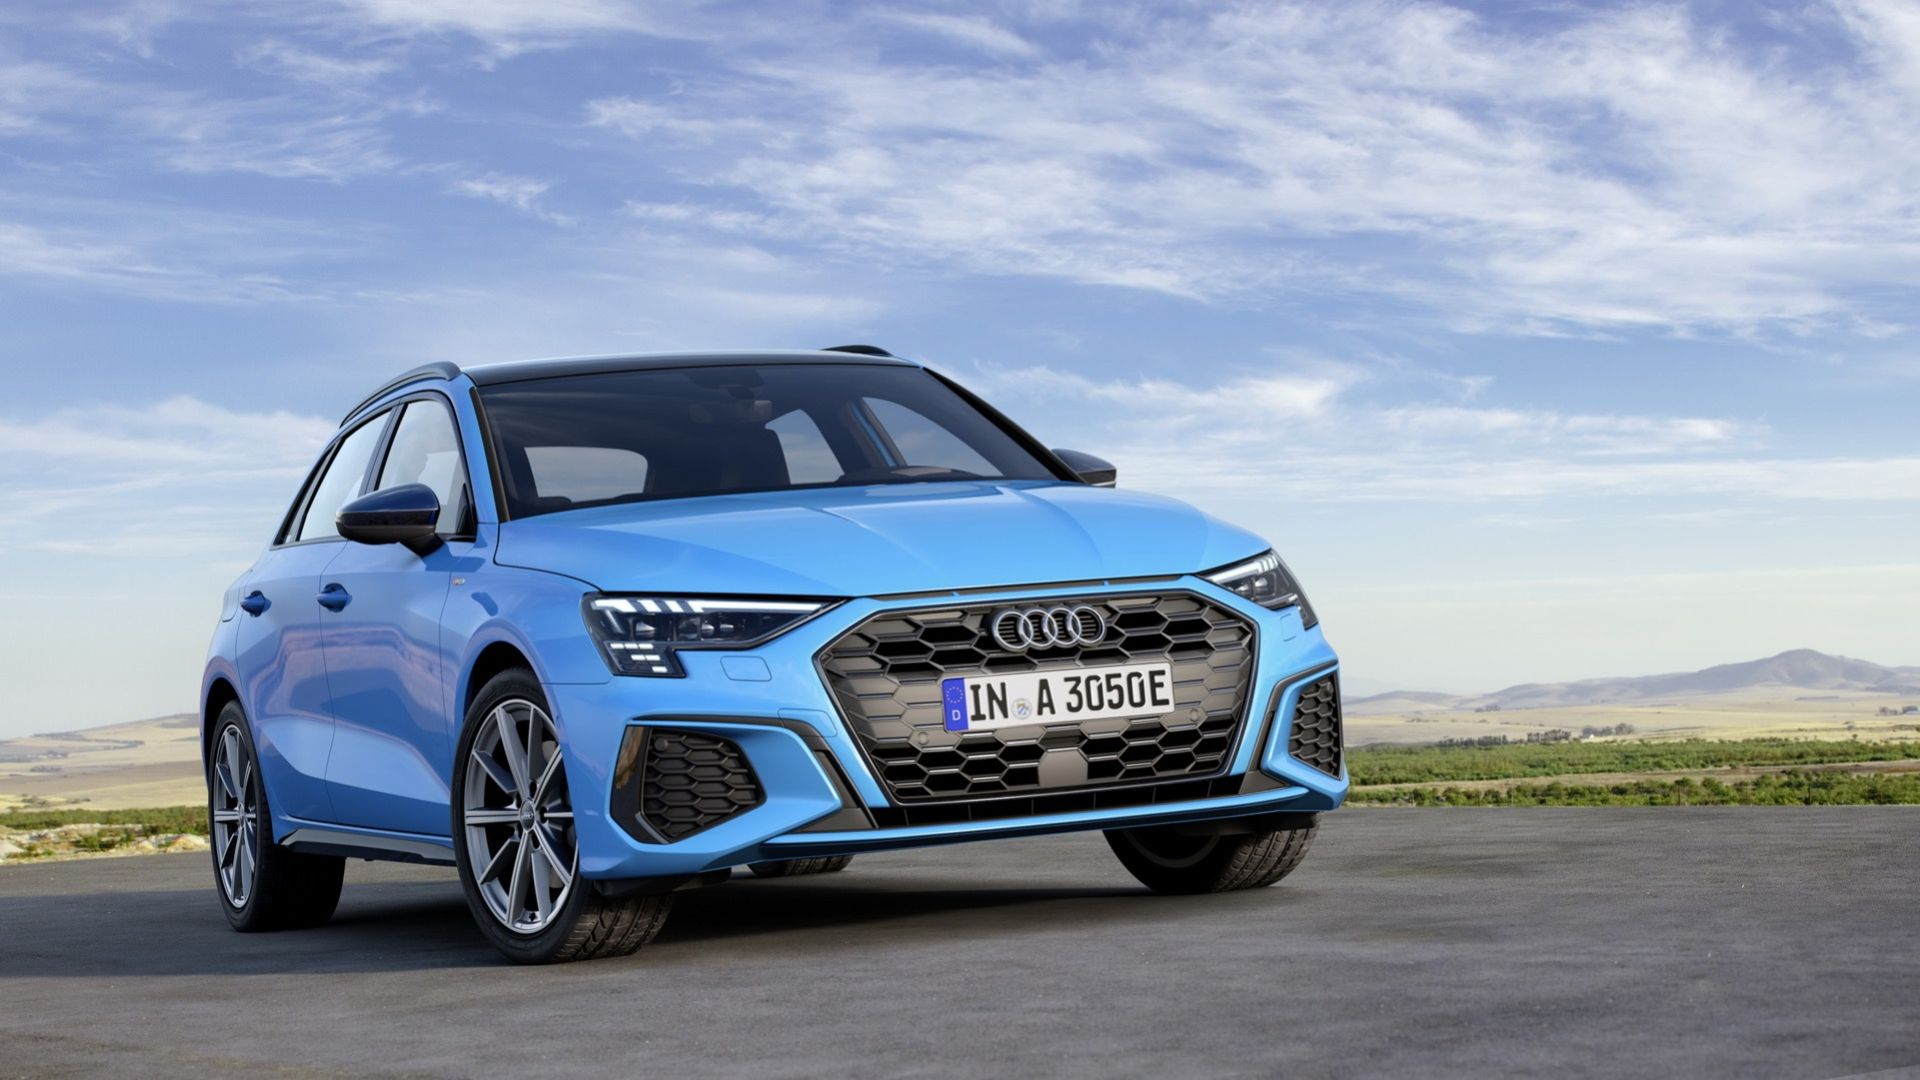 Nya Audi A3 Sportback som laddhybrid